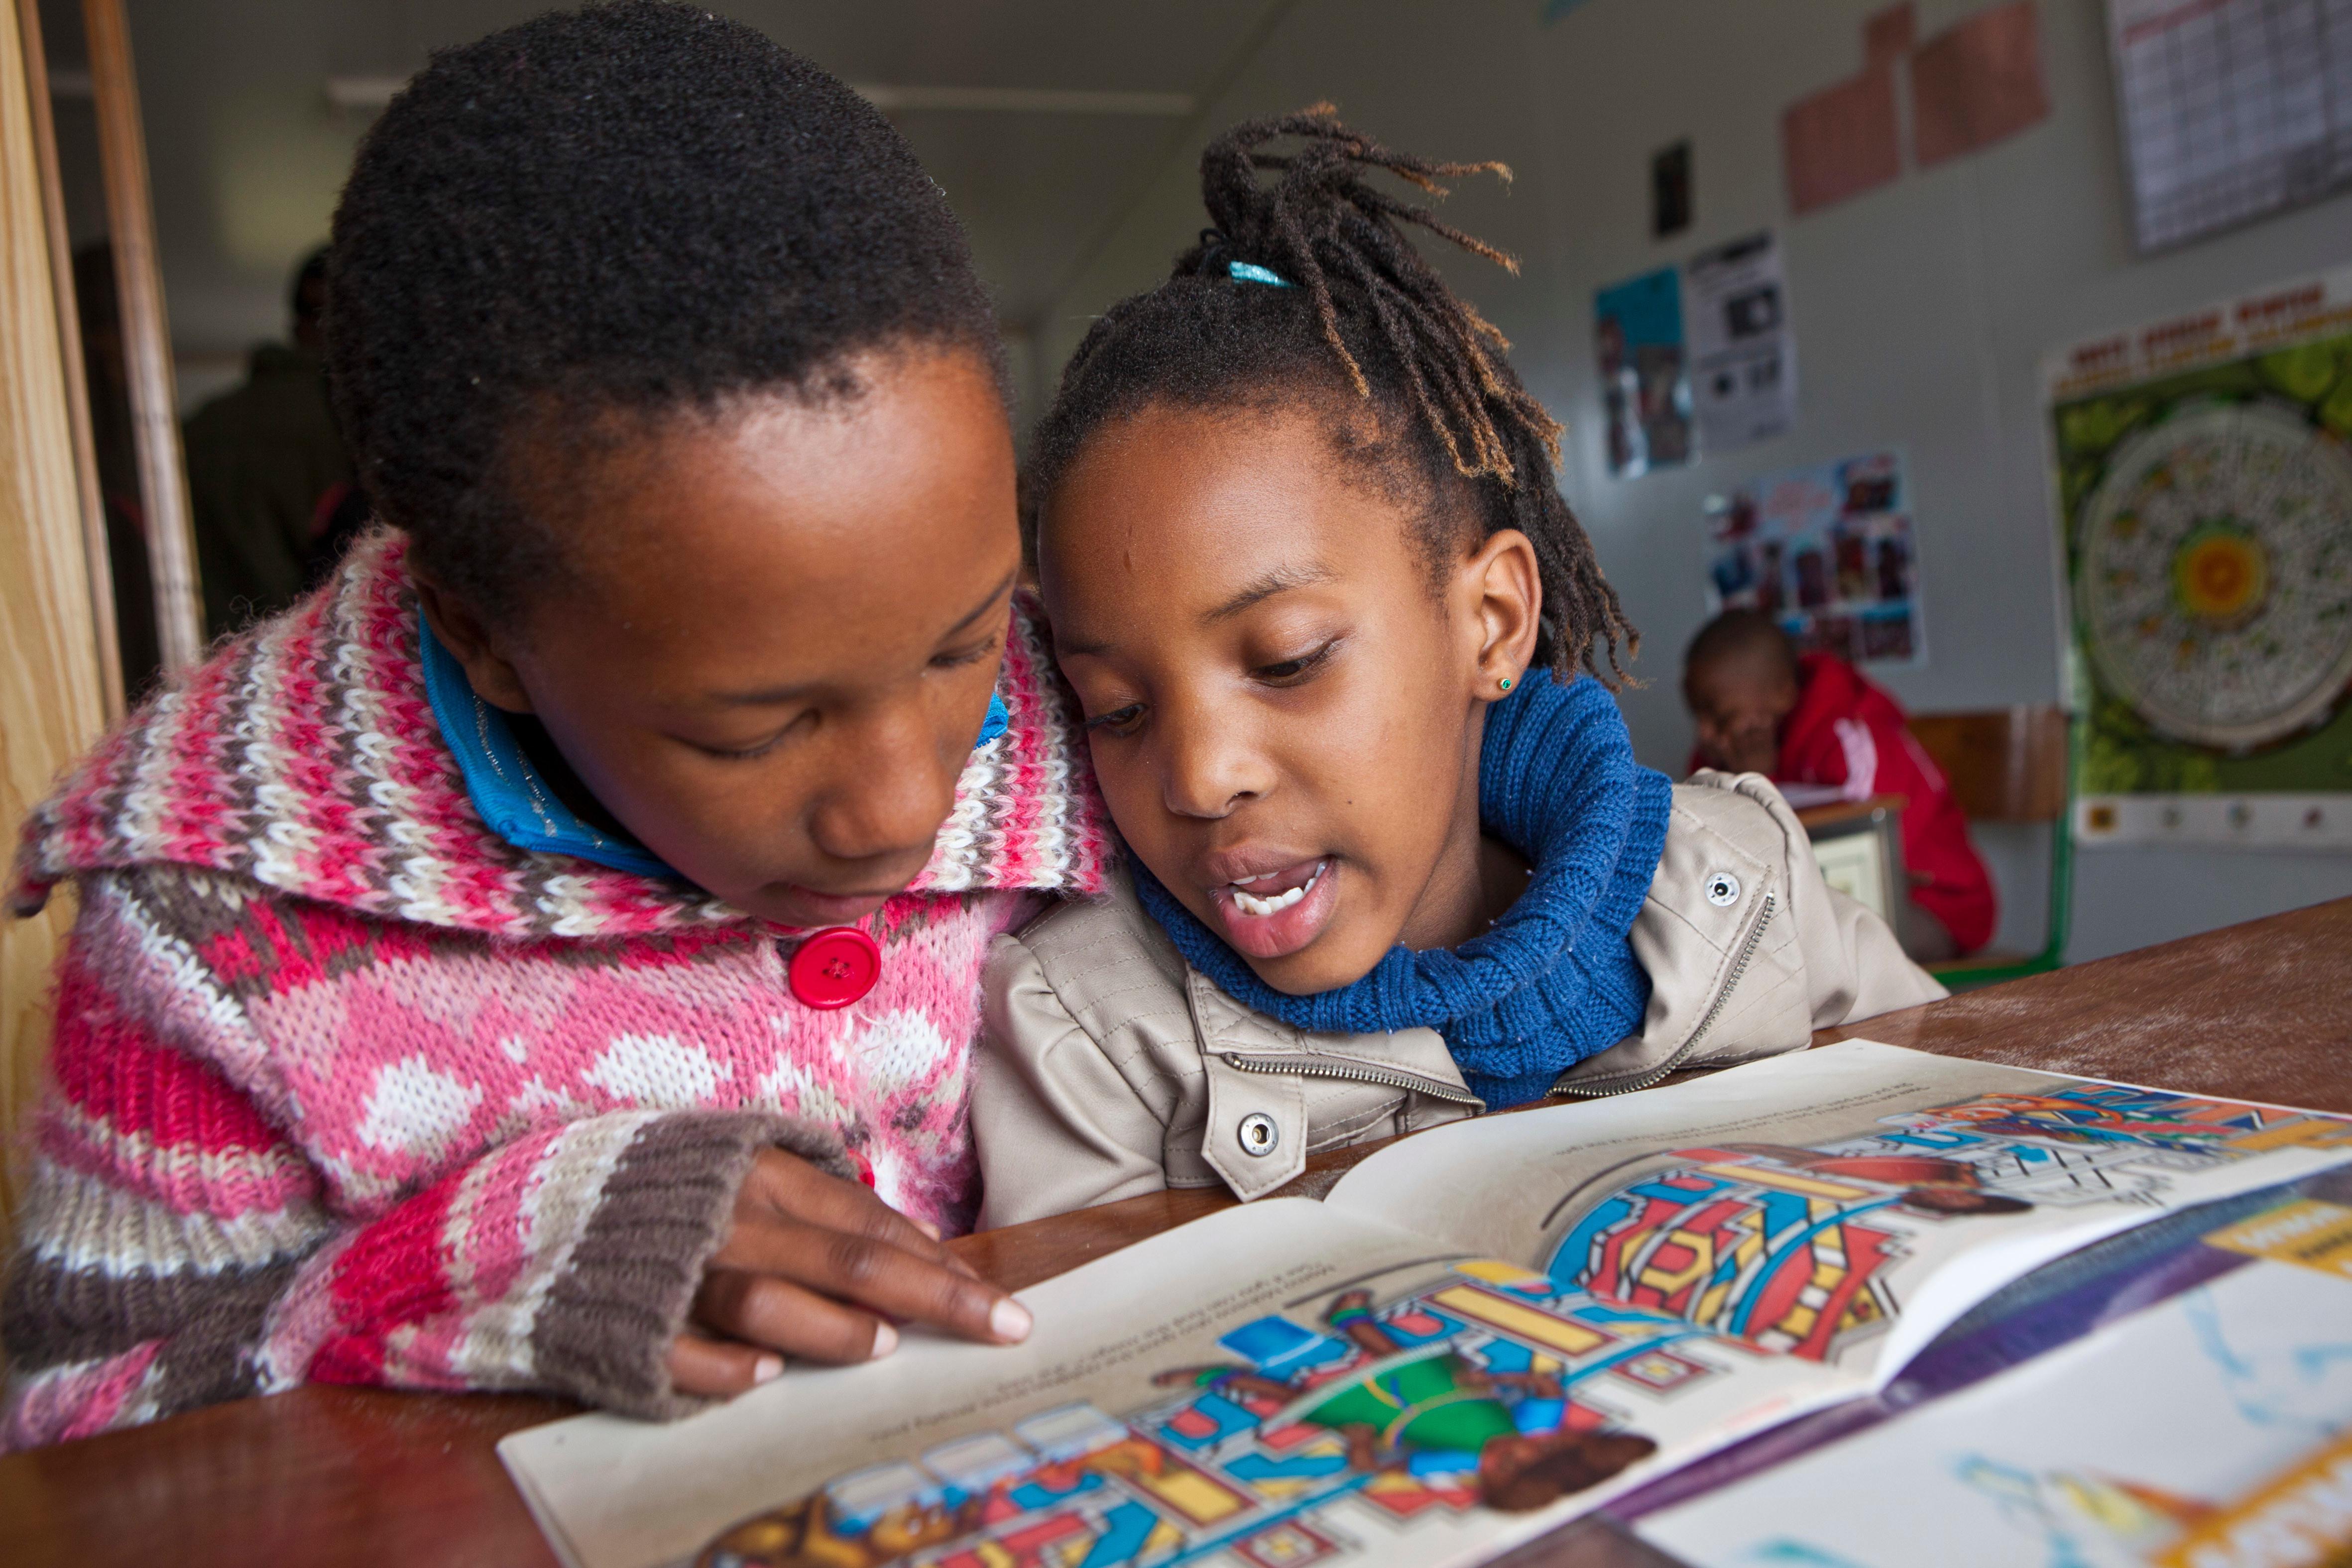 Afroresitance Children's Book Reading